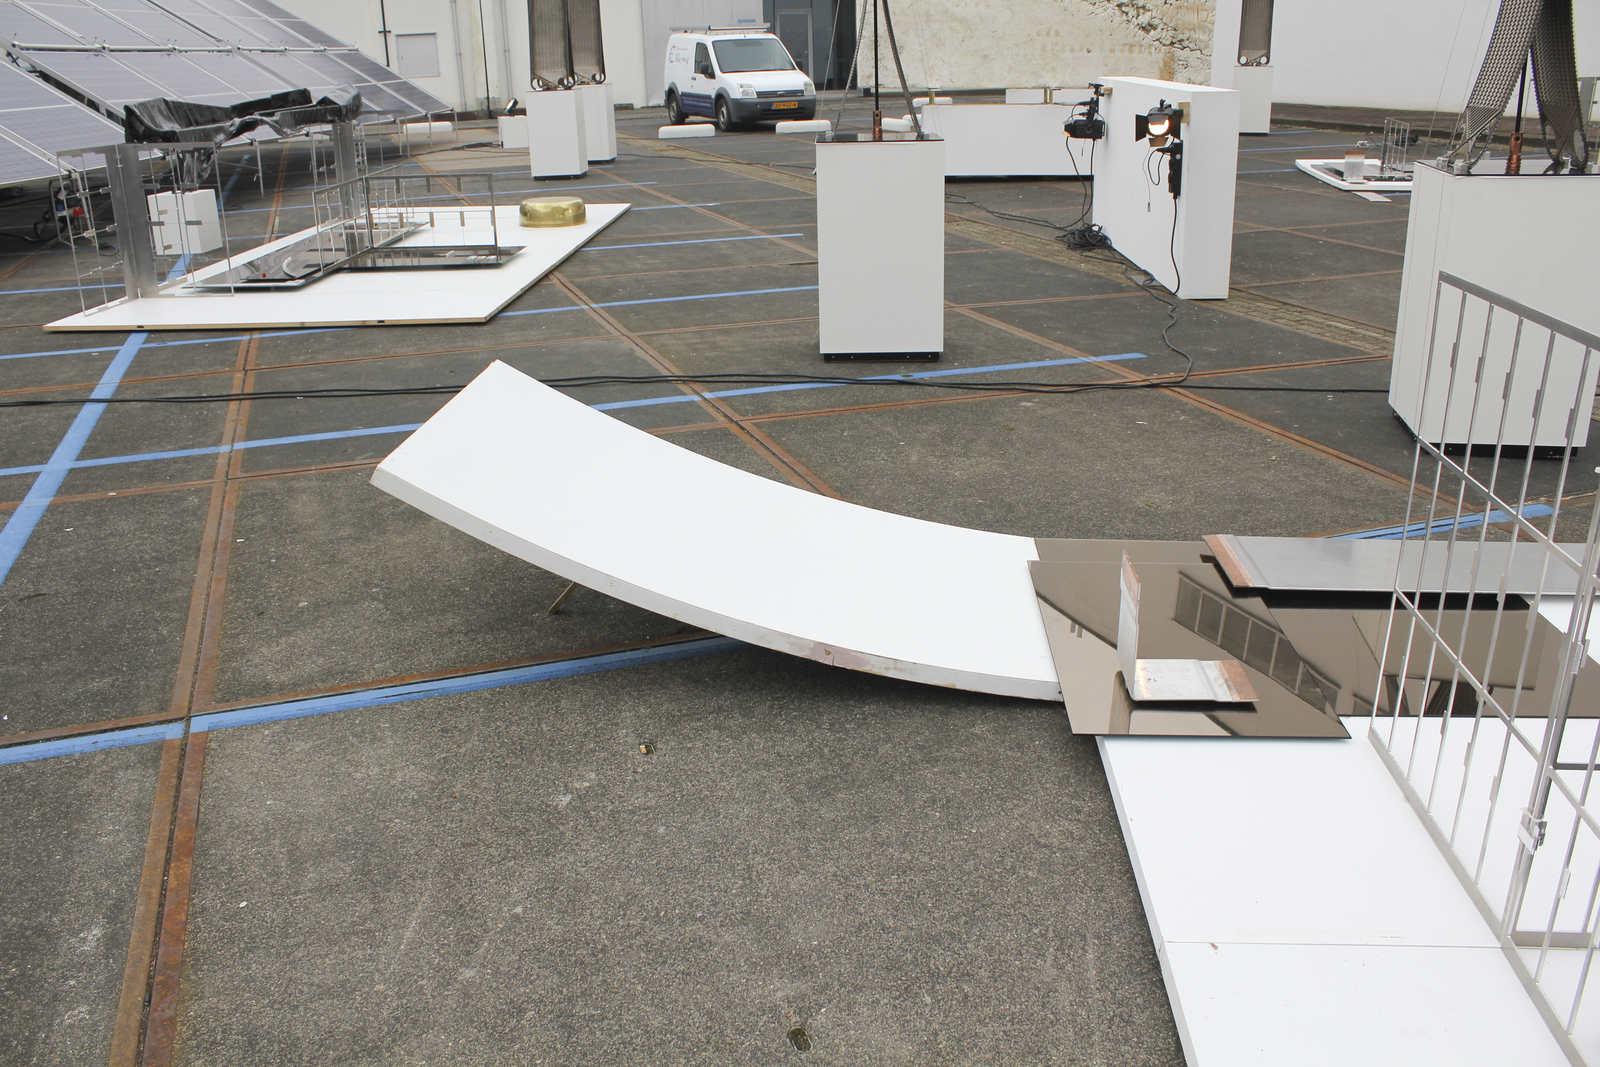 David Jablonowski at Art Rotterdam, Open Air 04